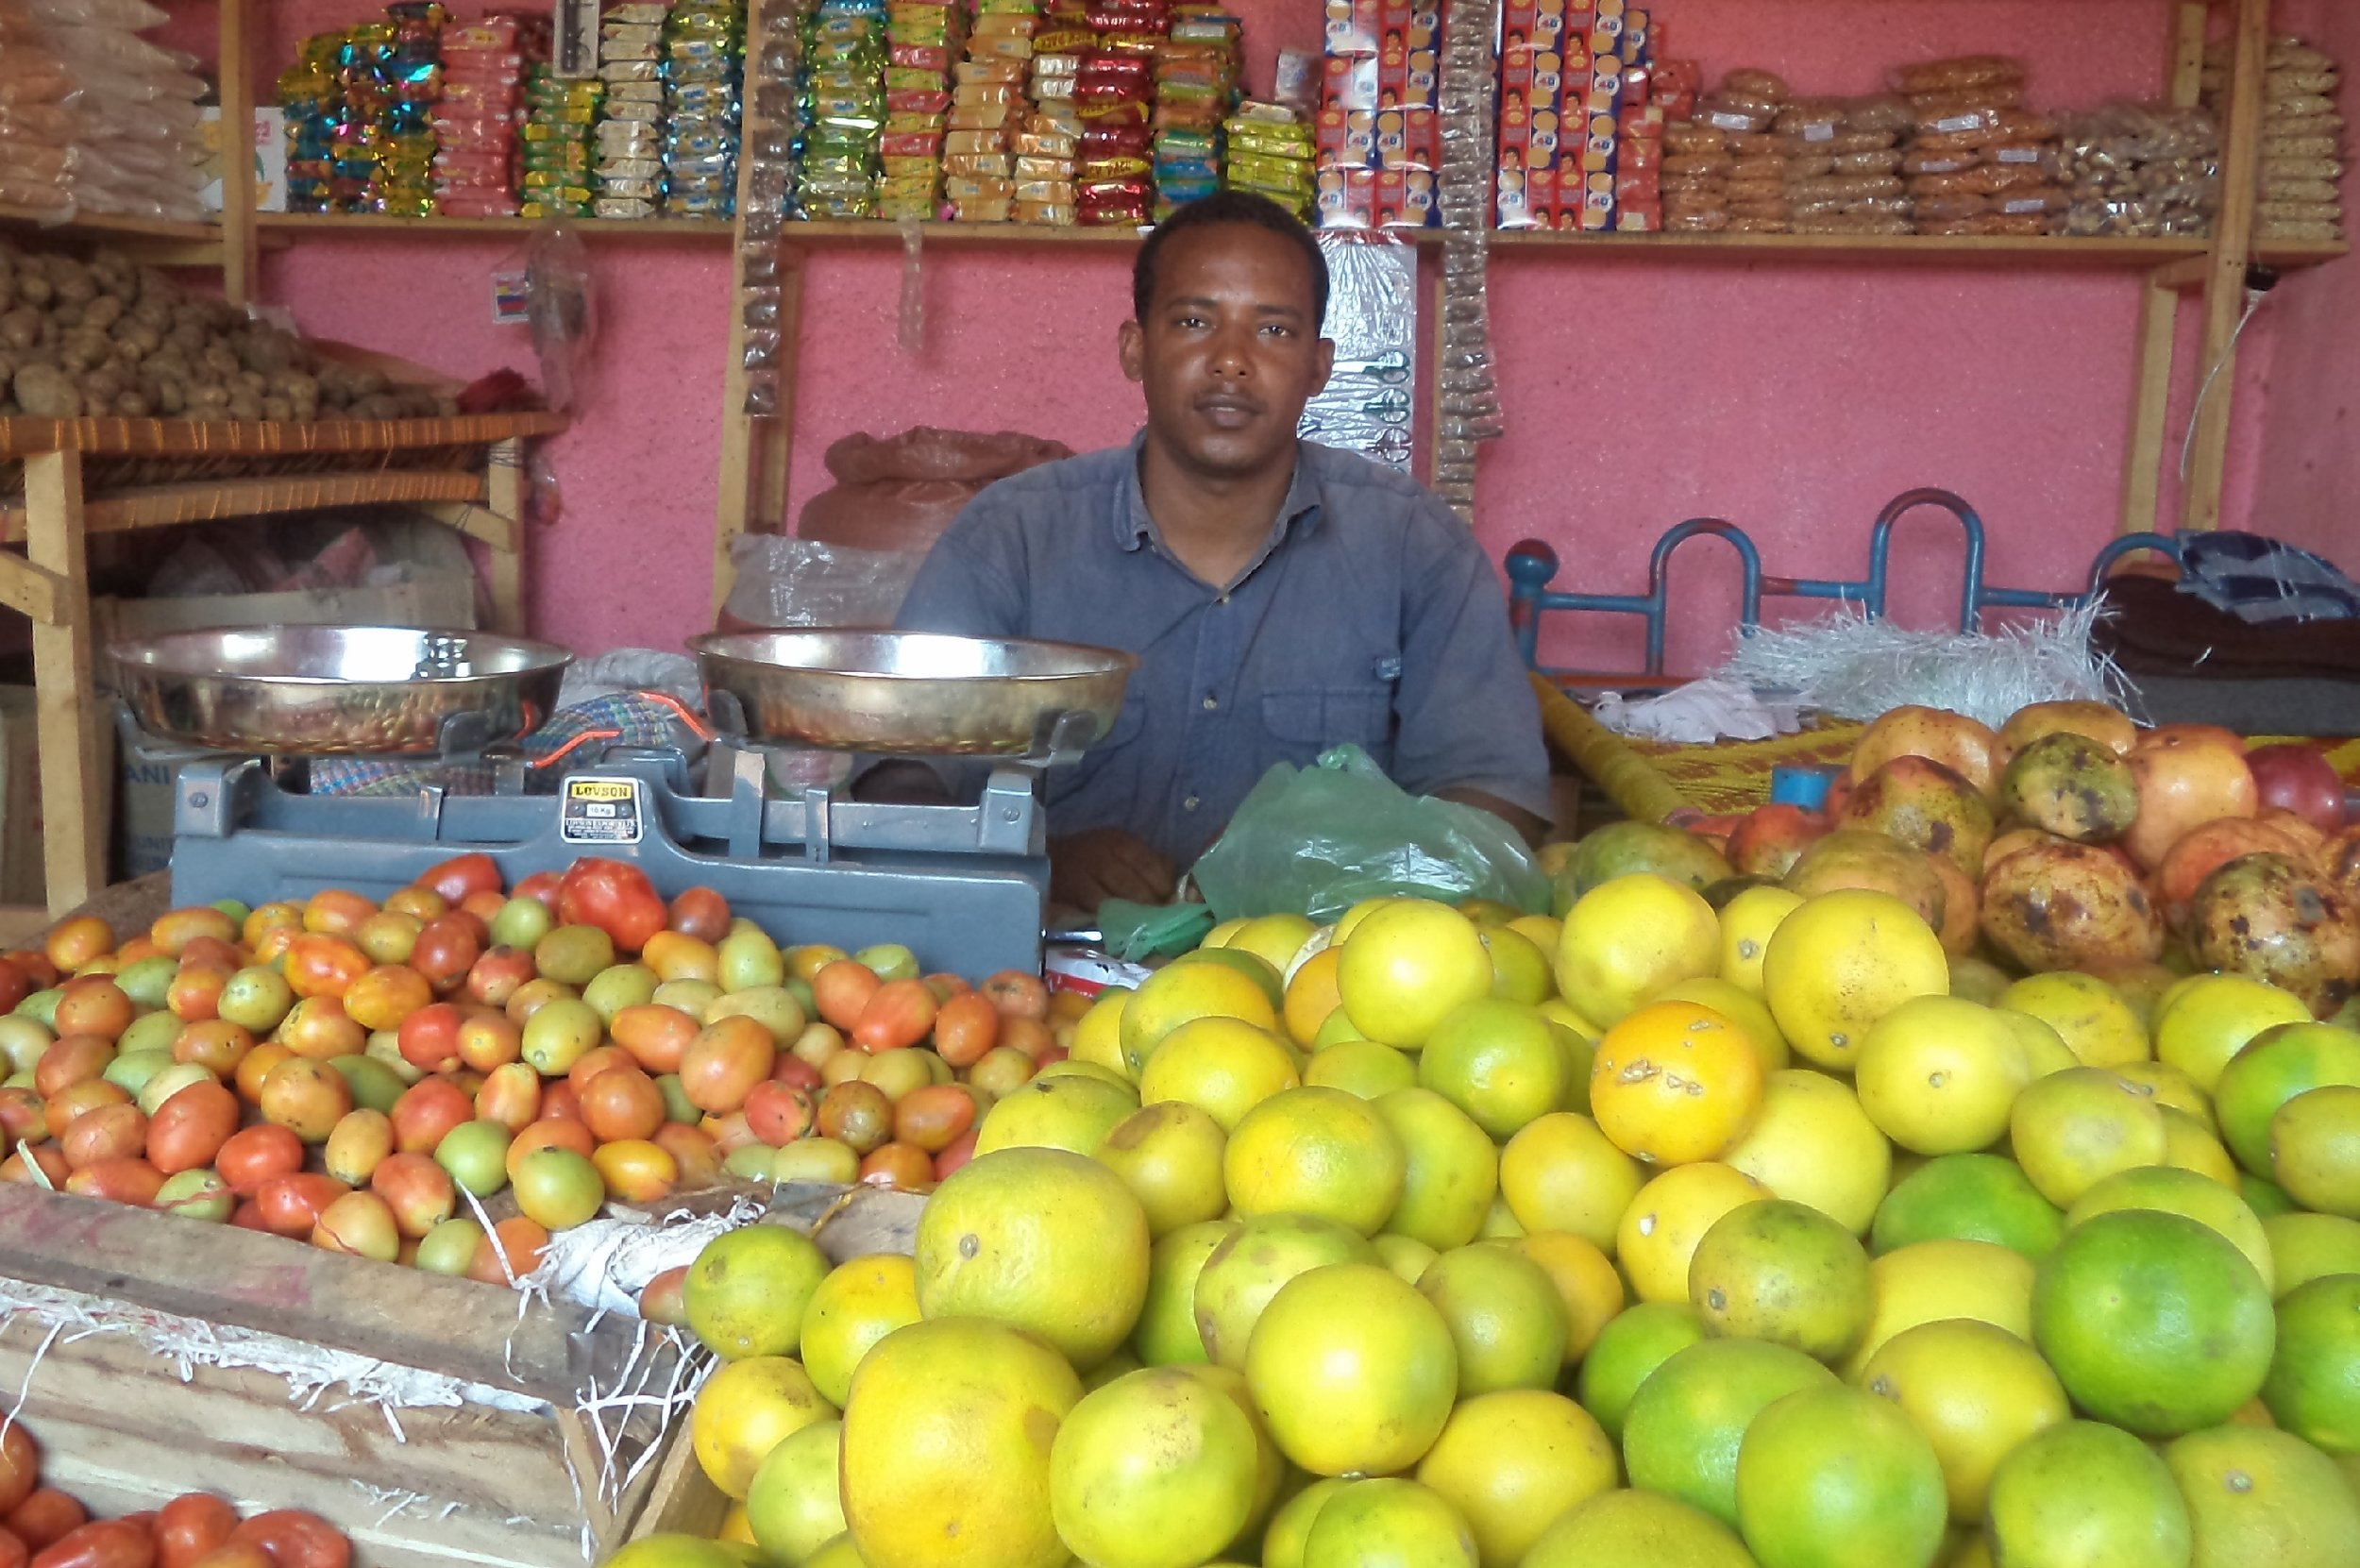 20141007_HAbrhaley_RefugeeEntrepreneur_Ethiopia_DSC00507.jpg